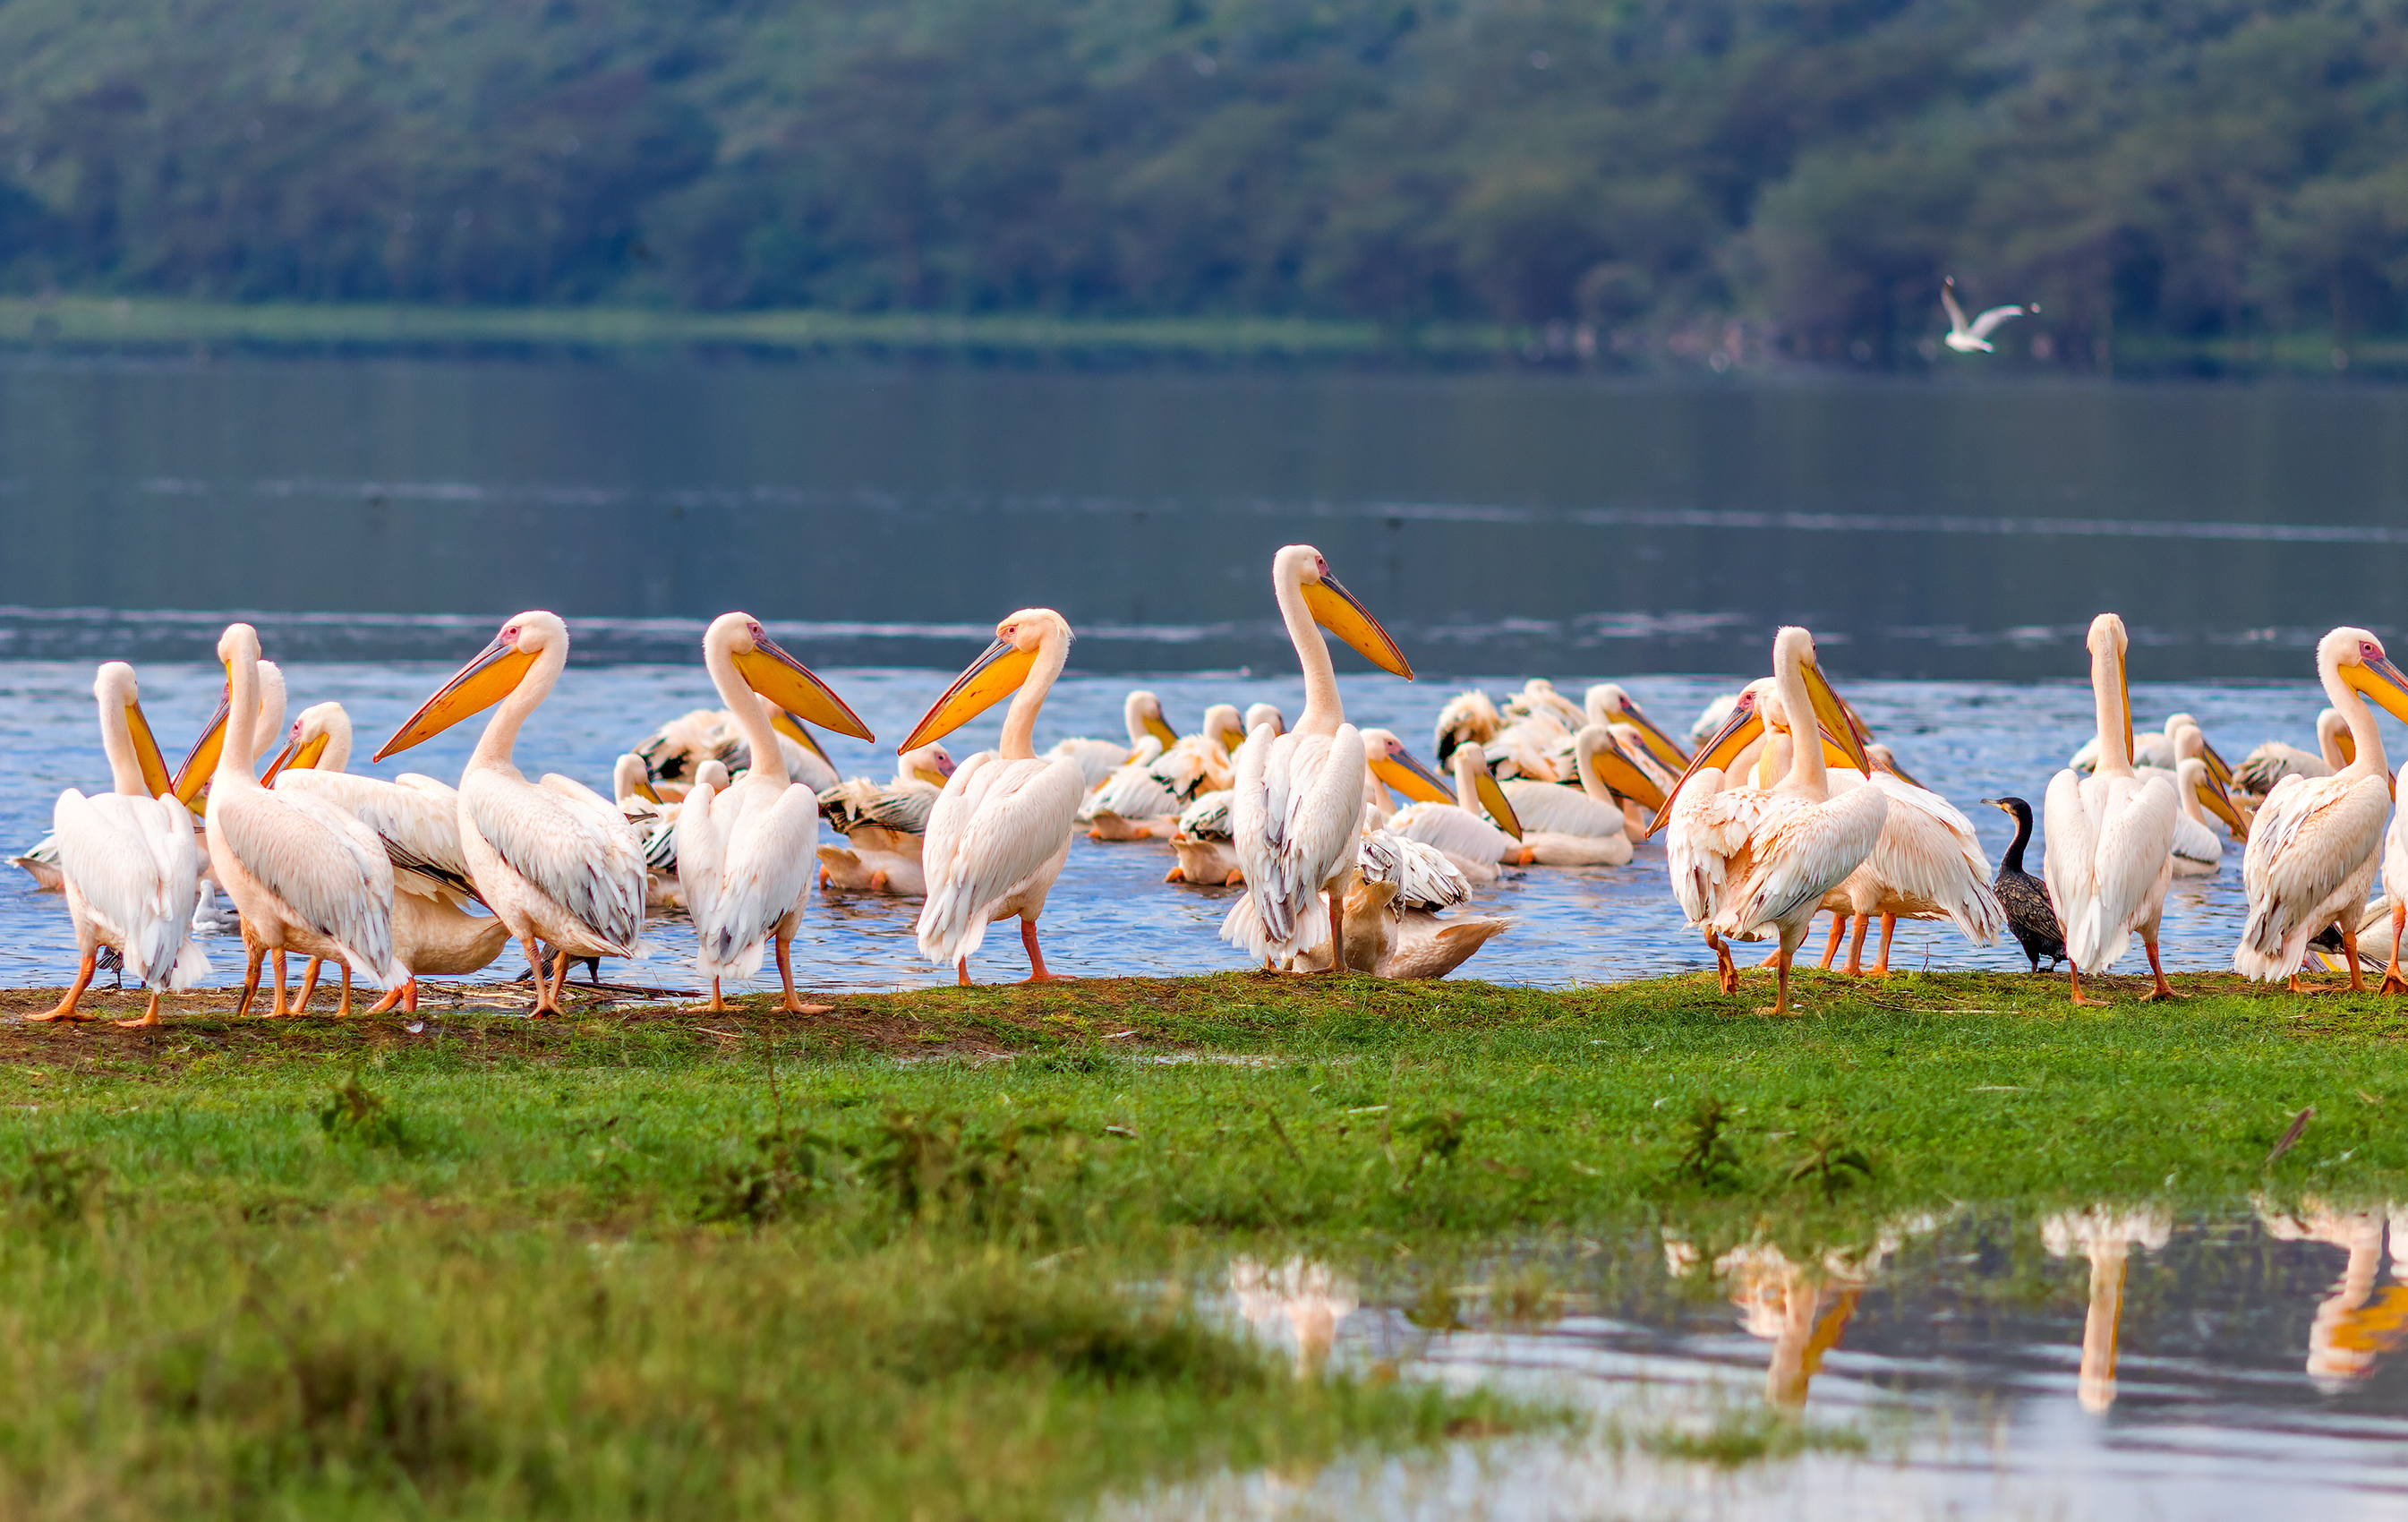 Explora uno de los lagos del gran valle del Rift - Kenia Safari Safari en Kenia: Parque Nacional de Tsavo